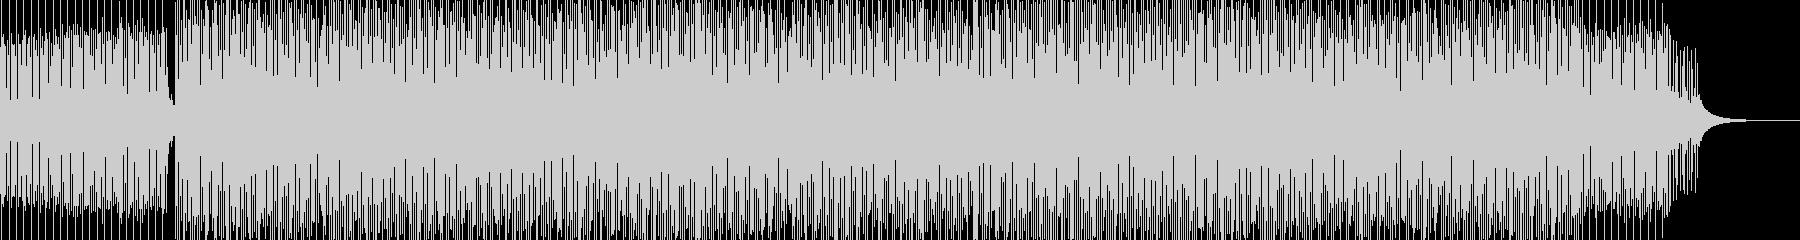 Rhodeピアノによるディープハウスの未再生の波形